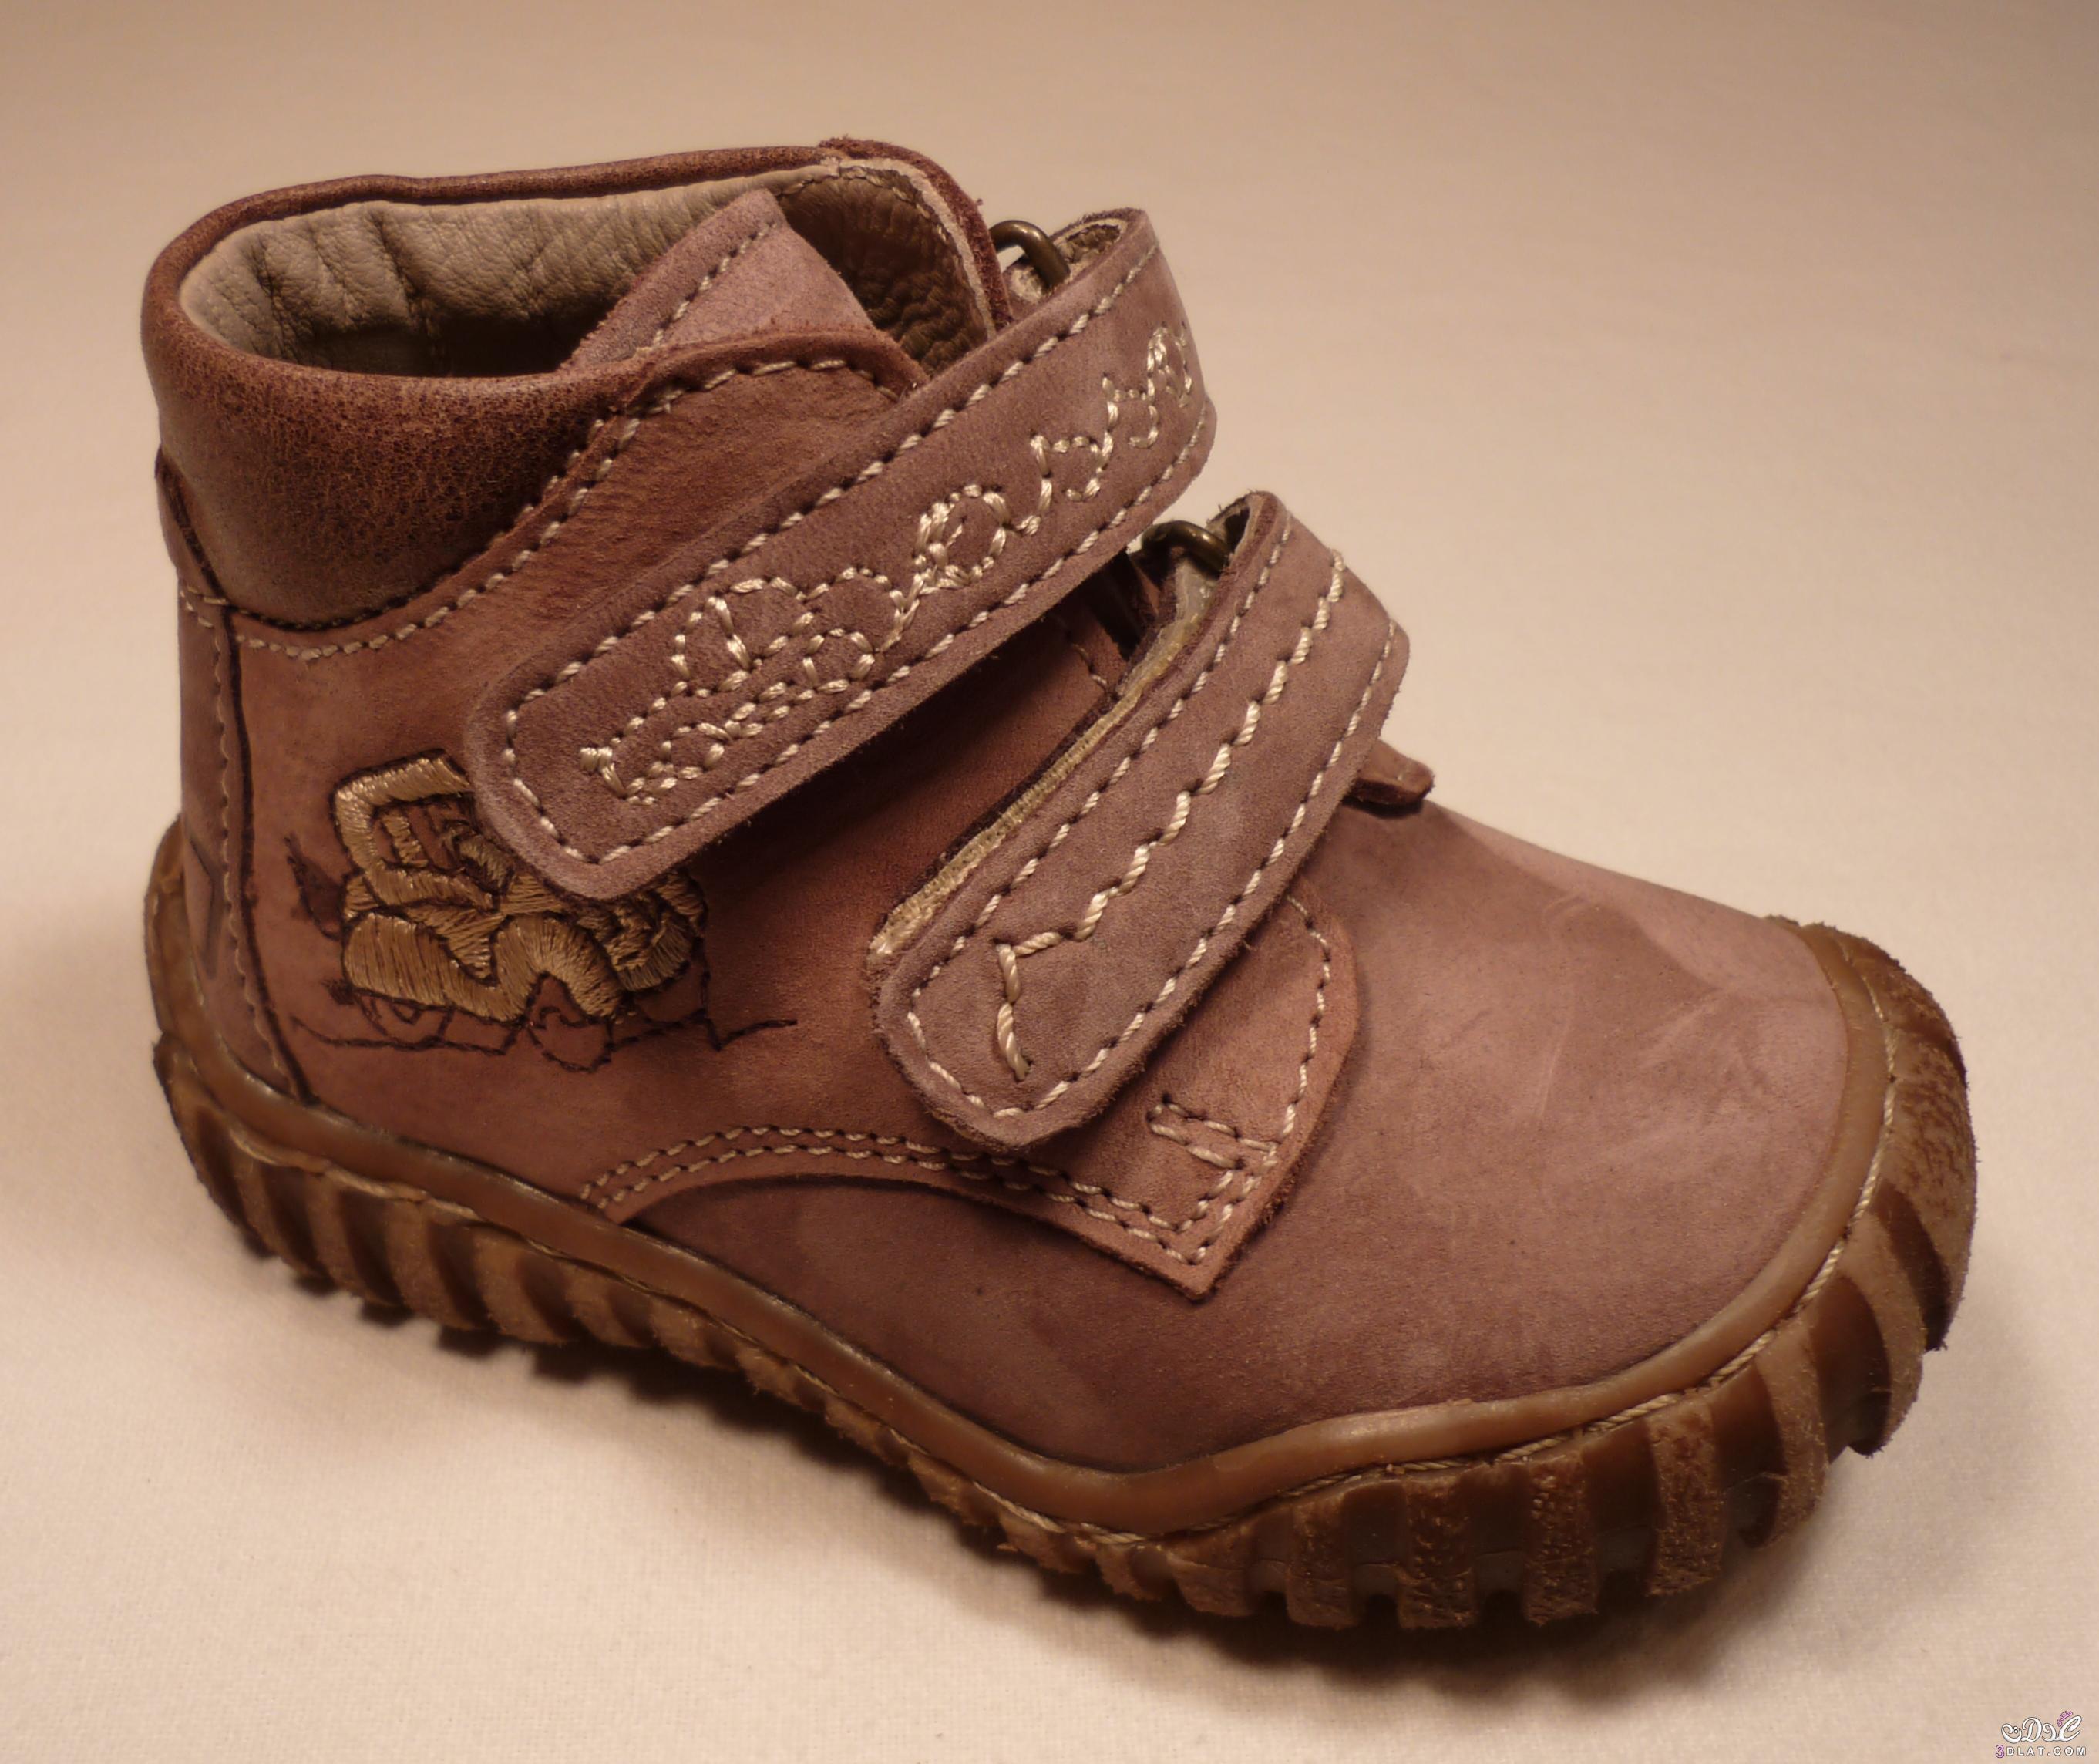 df048d7dc احذية اطفال , اشيك الاحذيه للاطفال - صور بنات